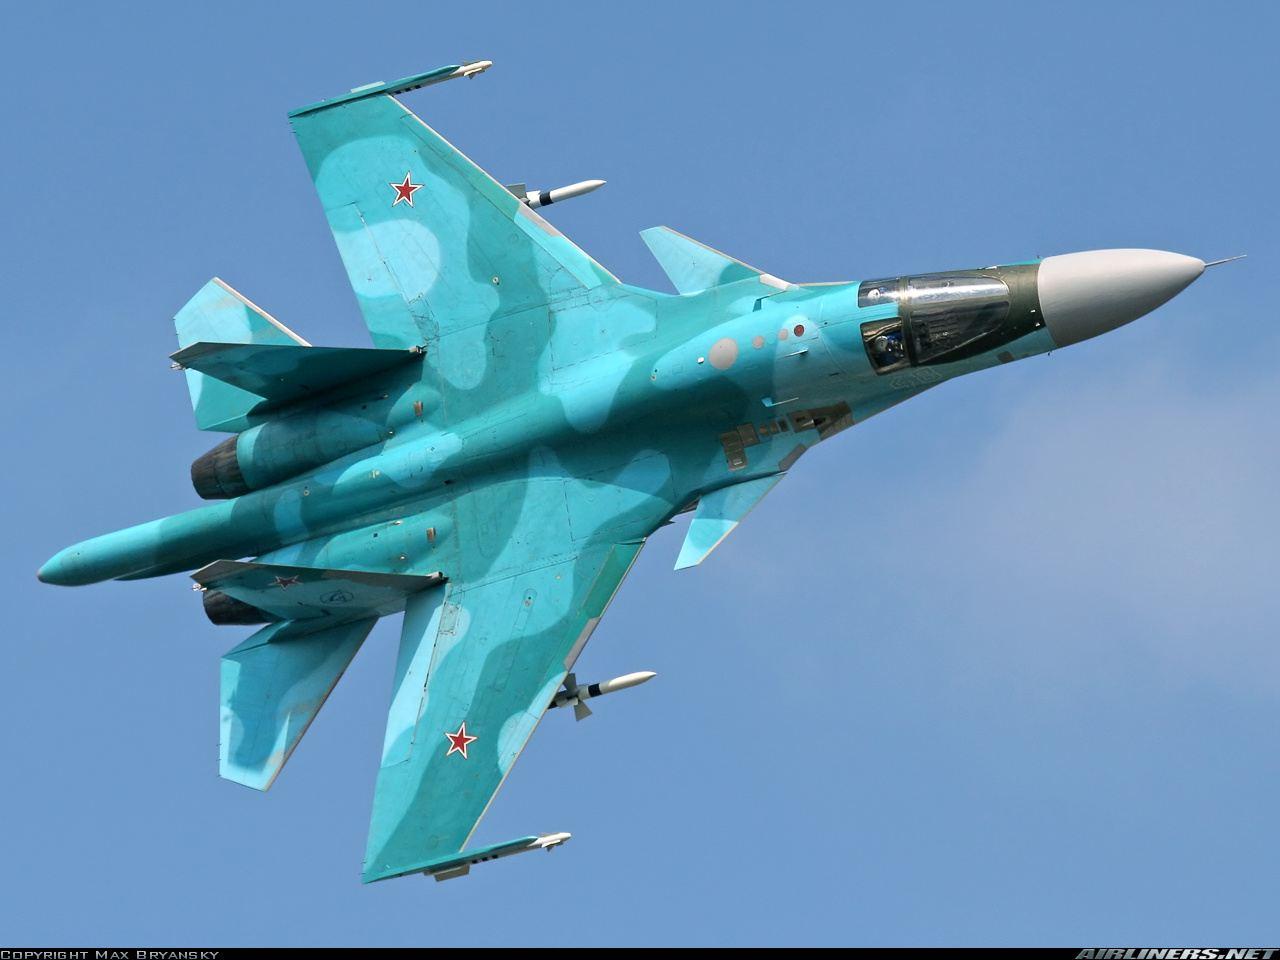 Su 34 (航空機)の画像 p1_30